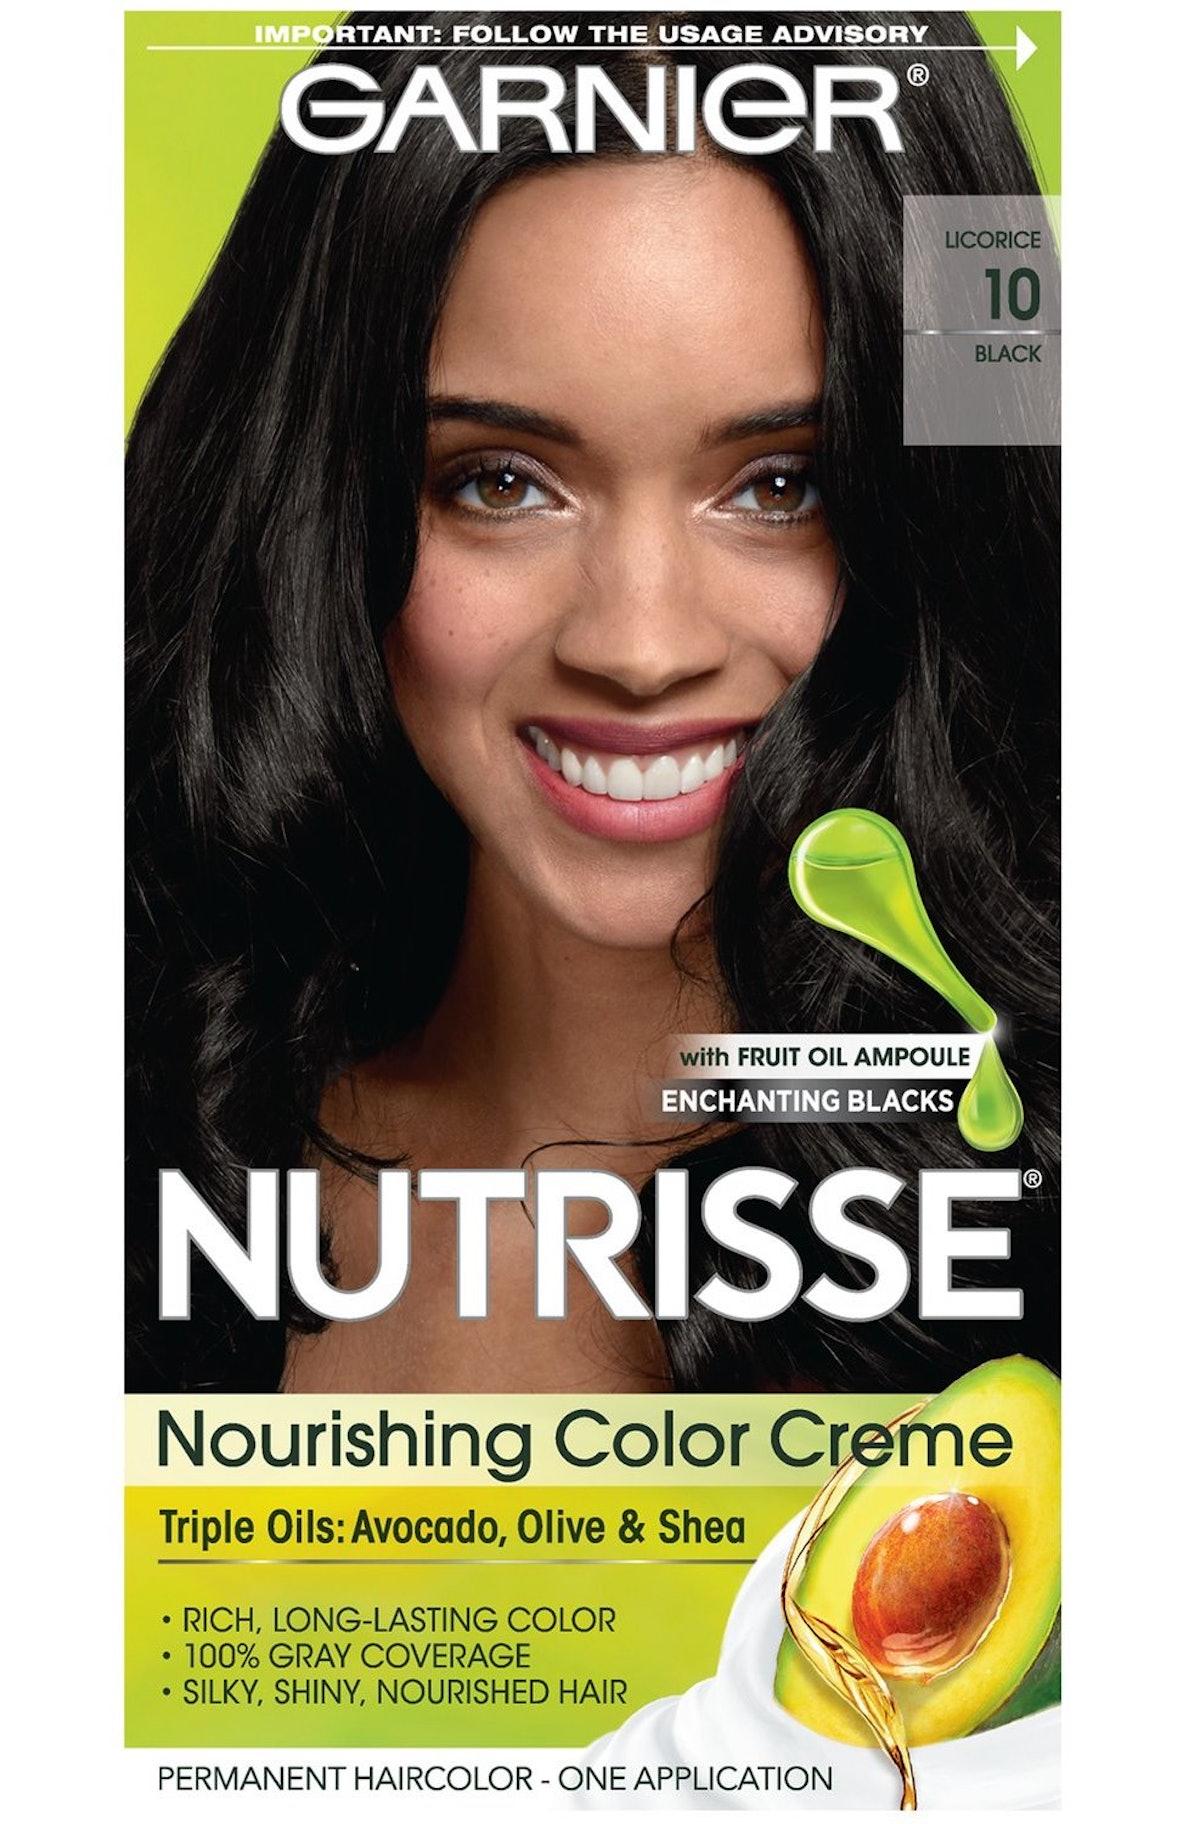 Garnier Nutrisse Nourishing Hair Color Creme